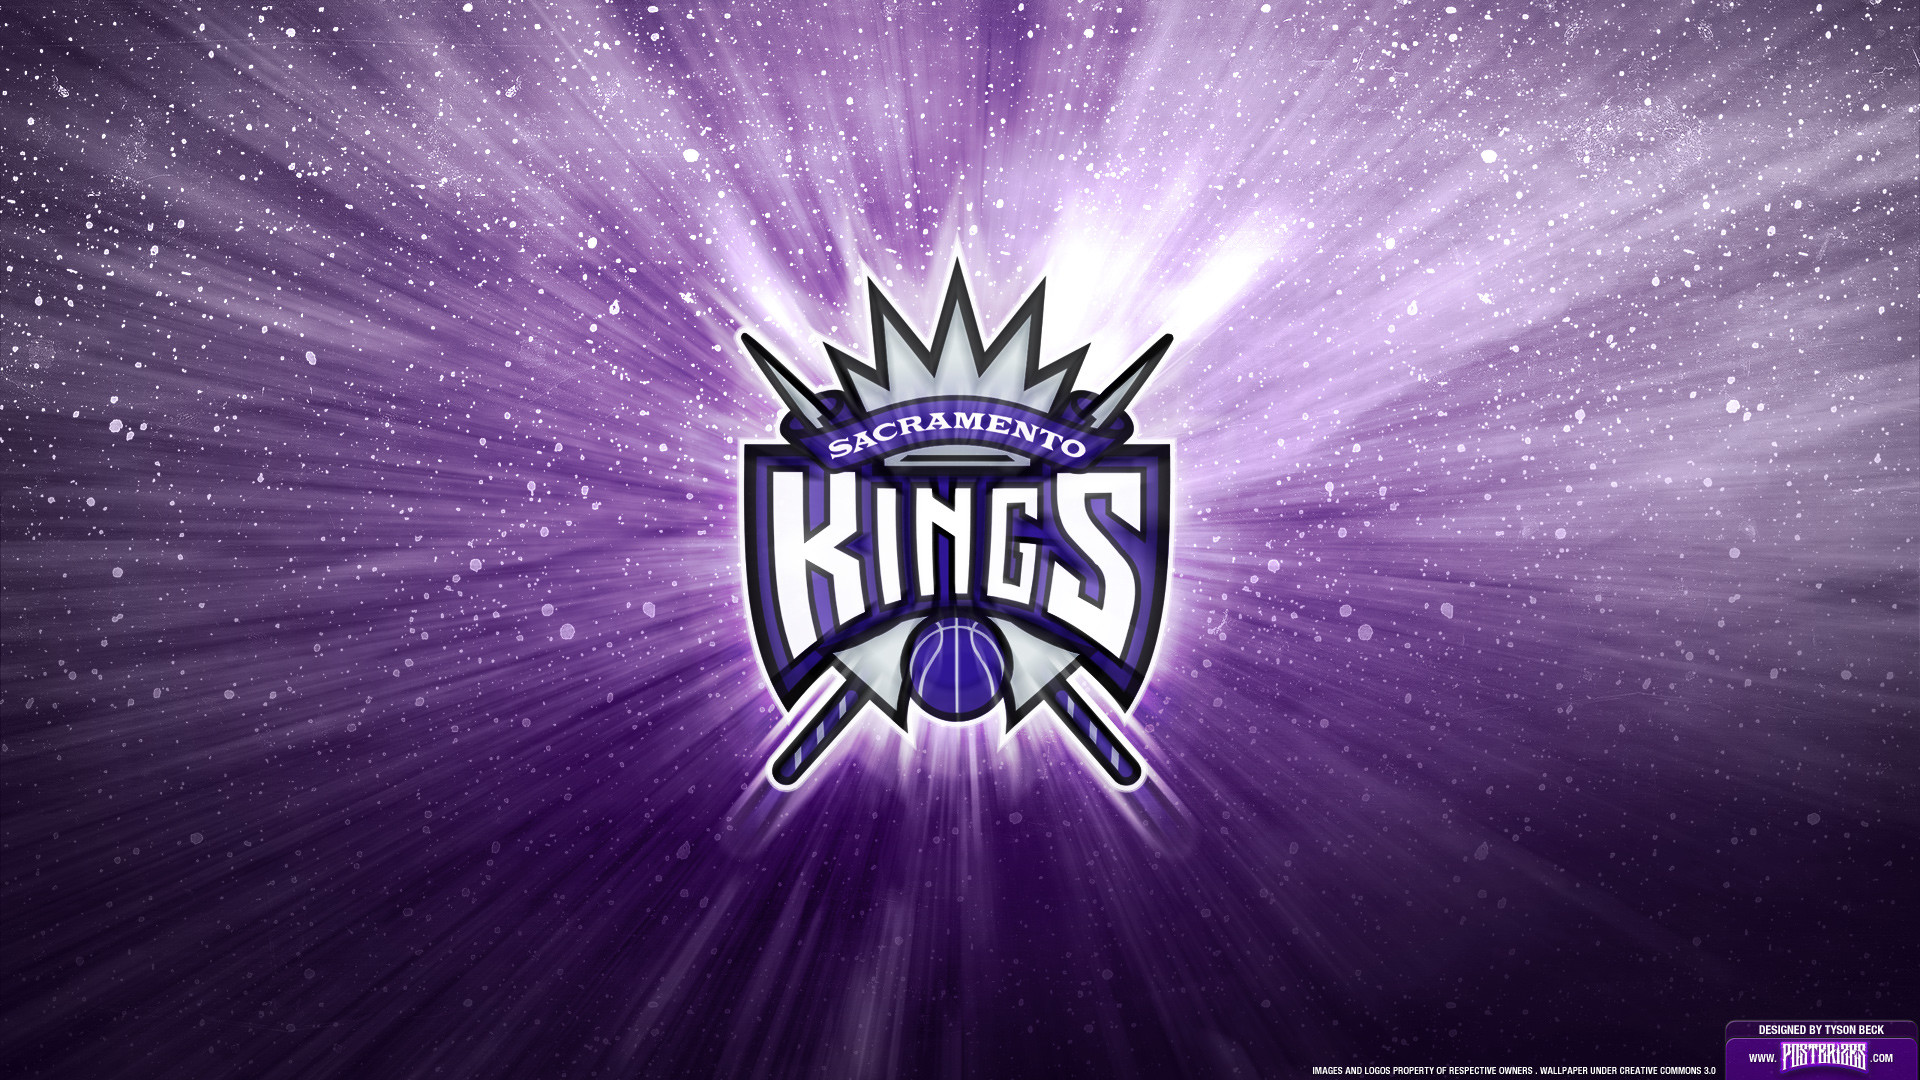 SACRAMENTO KINGS nba basketball (25) wallpaper | | 227730 |  WallpaperUP